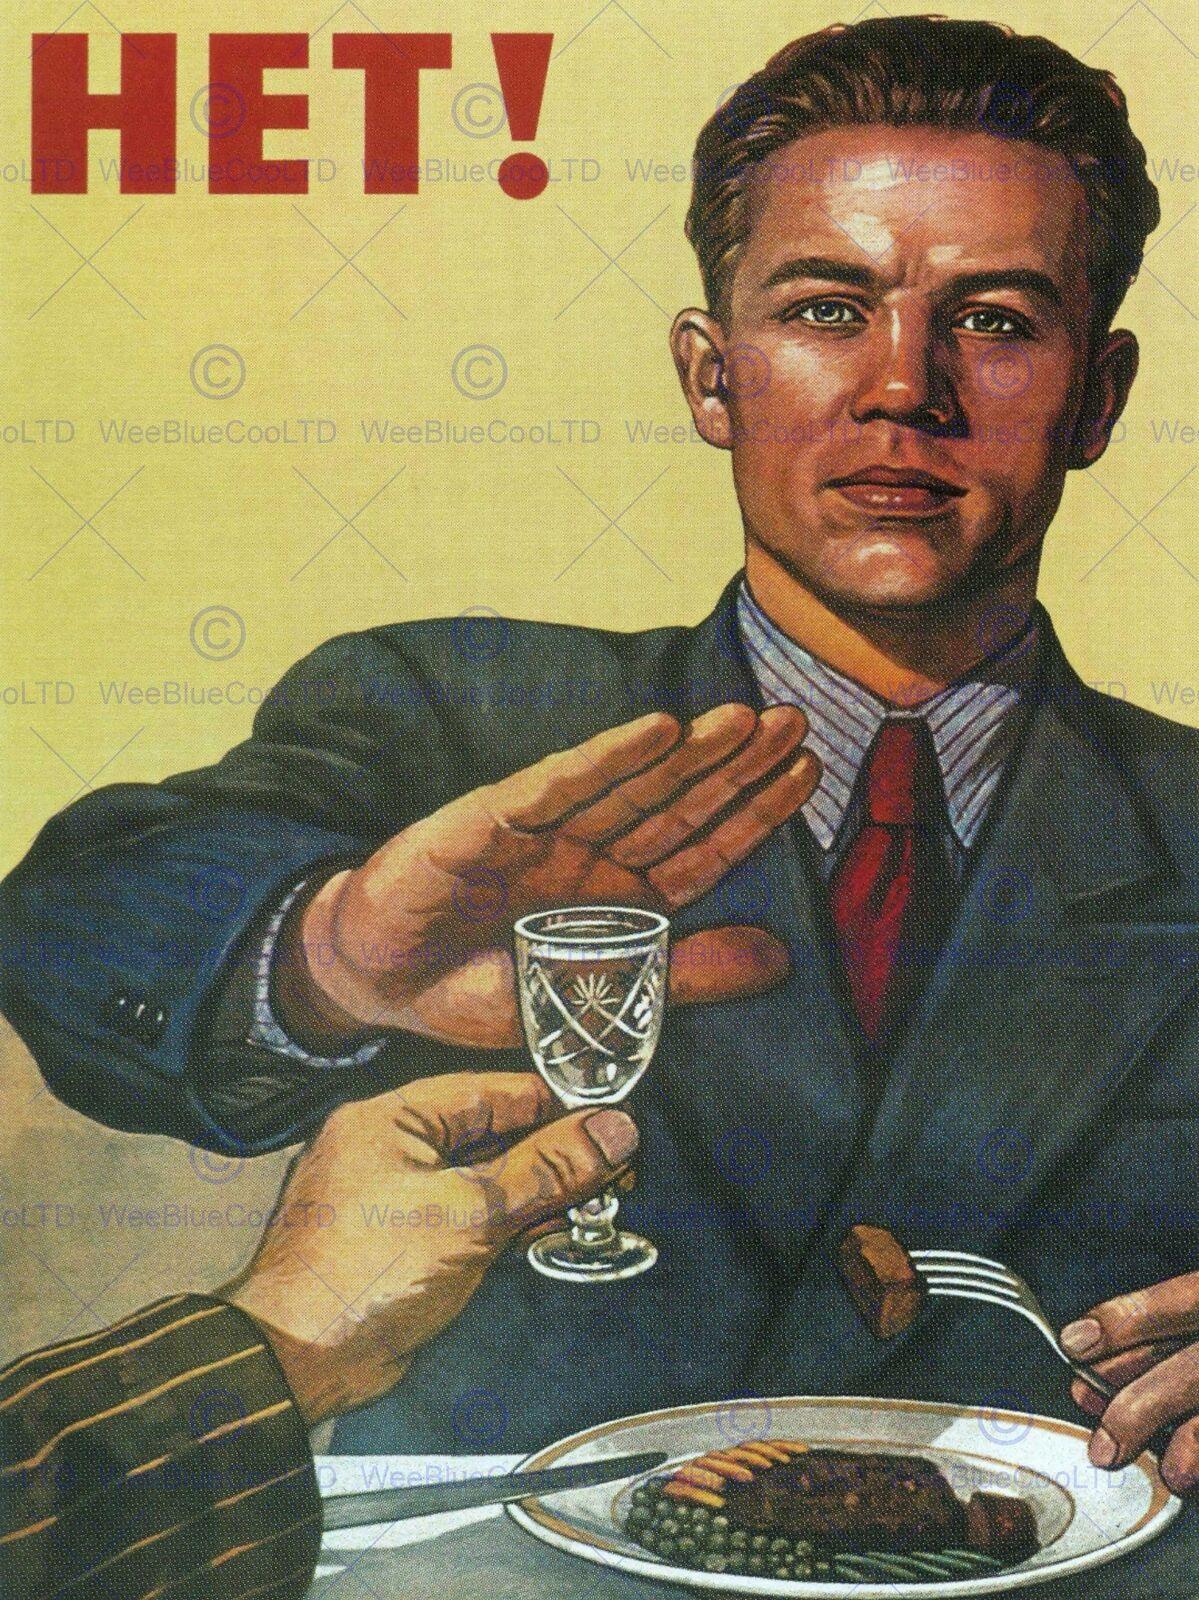 PROPAGANDA POLITICAL COMMUNISM USSR HOSPITALITY CATER SOVIET FOOD POSTER BB2536A